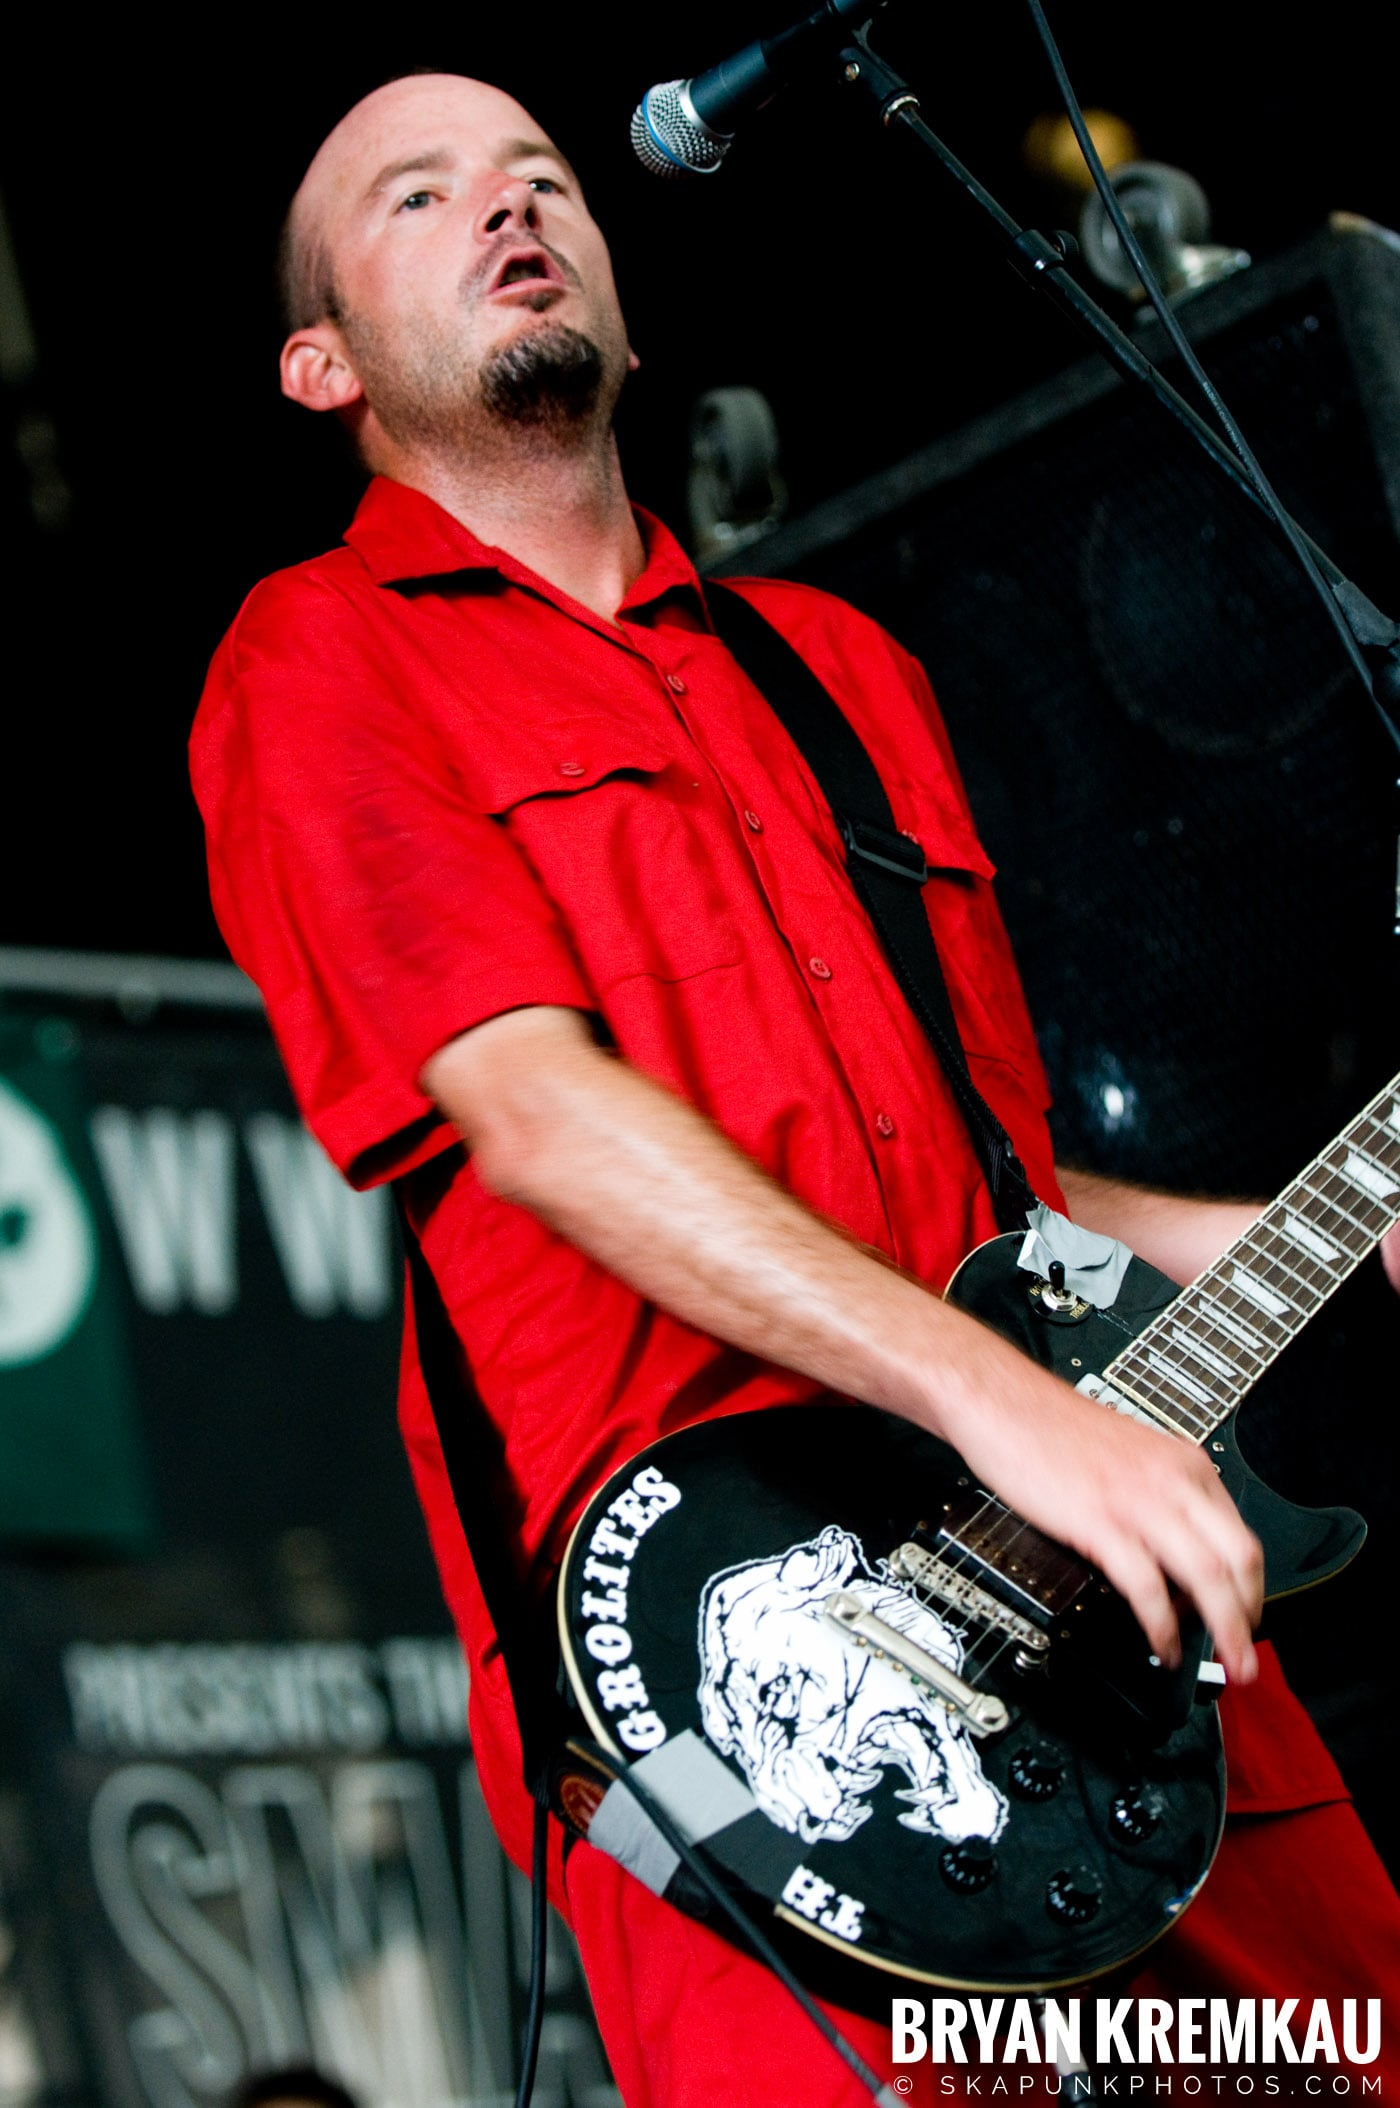 The Aggrolites @ Warped Tour 08, Scranton PA - 7.27.08 (4)